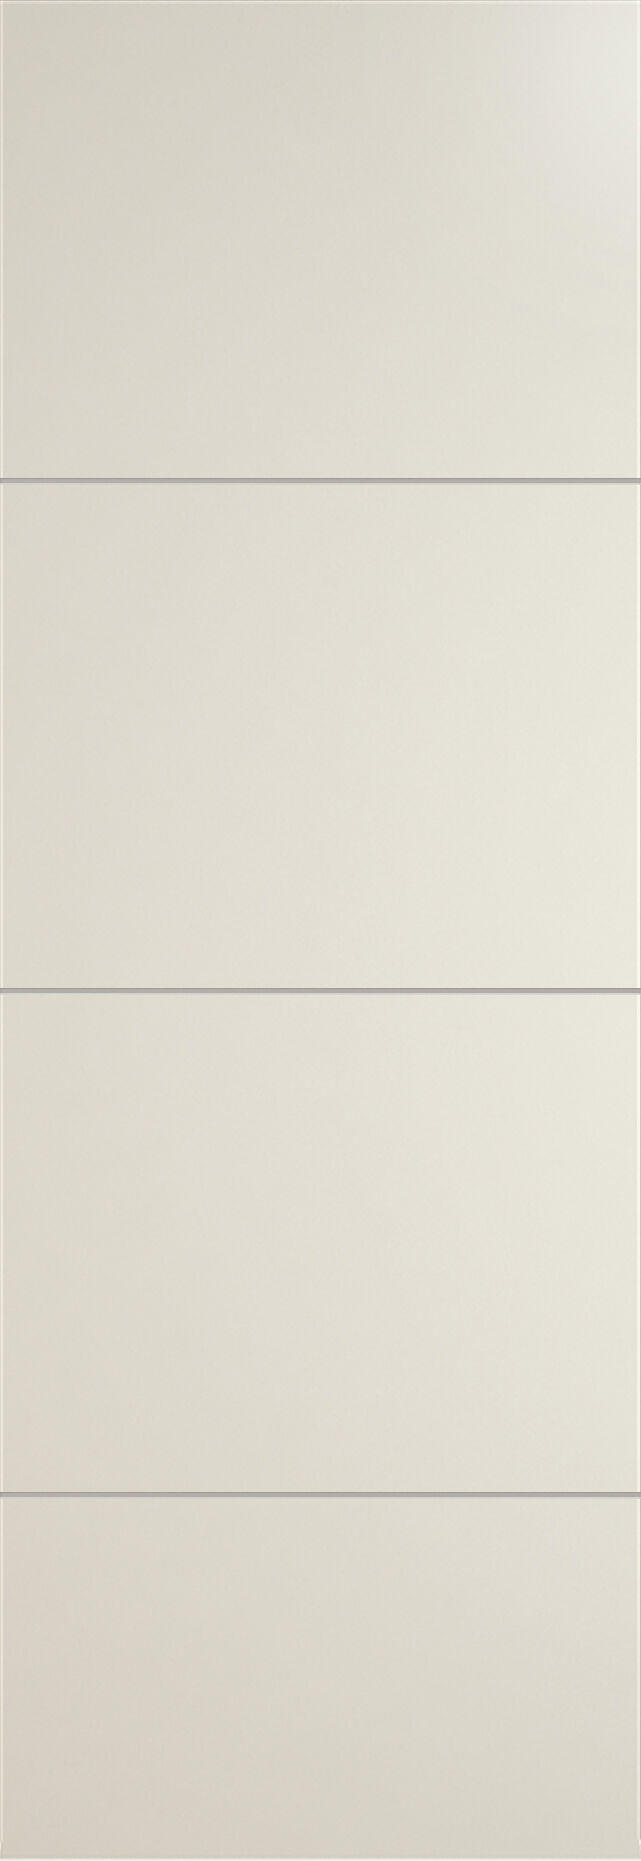 Tivoli Г-2 Invisible цвет - Жемчужная эмаль Без стекла (ДГ)